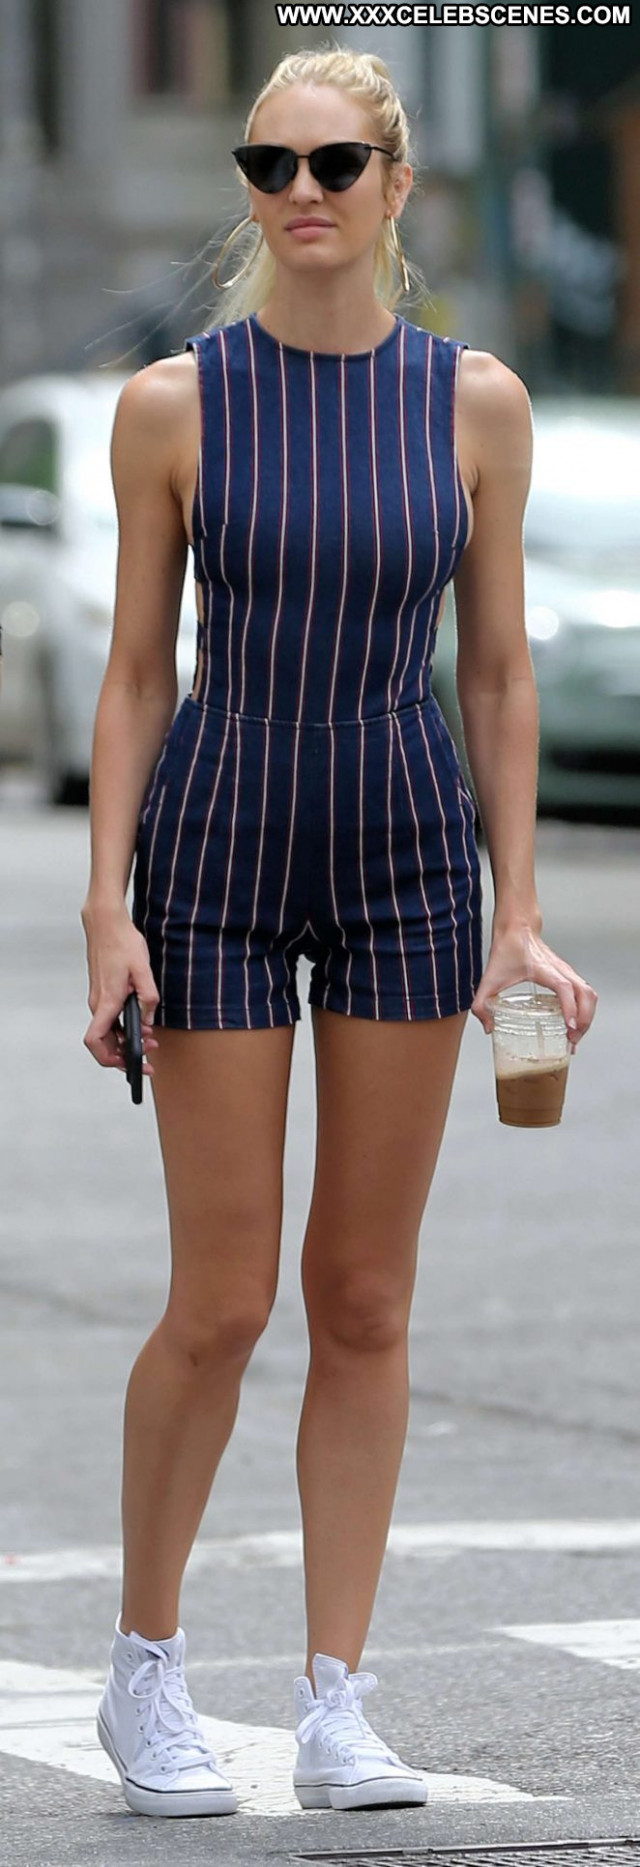 Candice Swanepoel New York Paparazzi New York Babe Beautiful